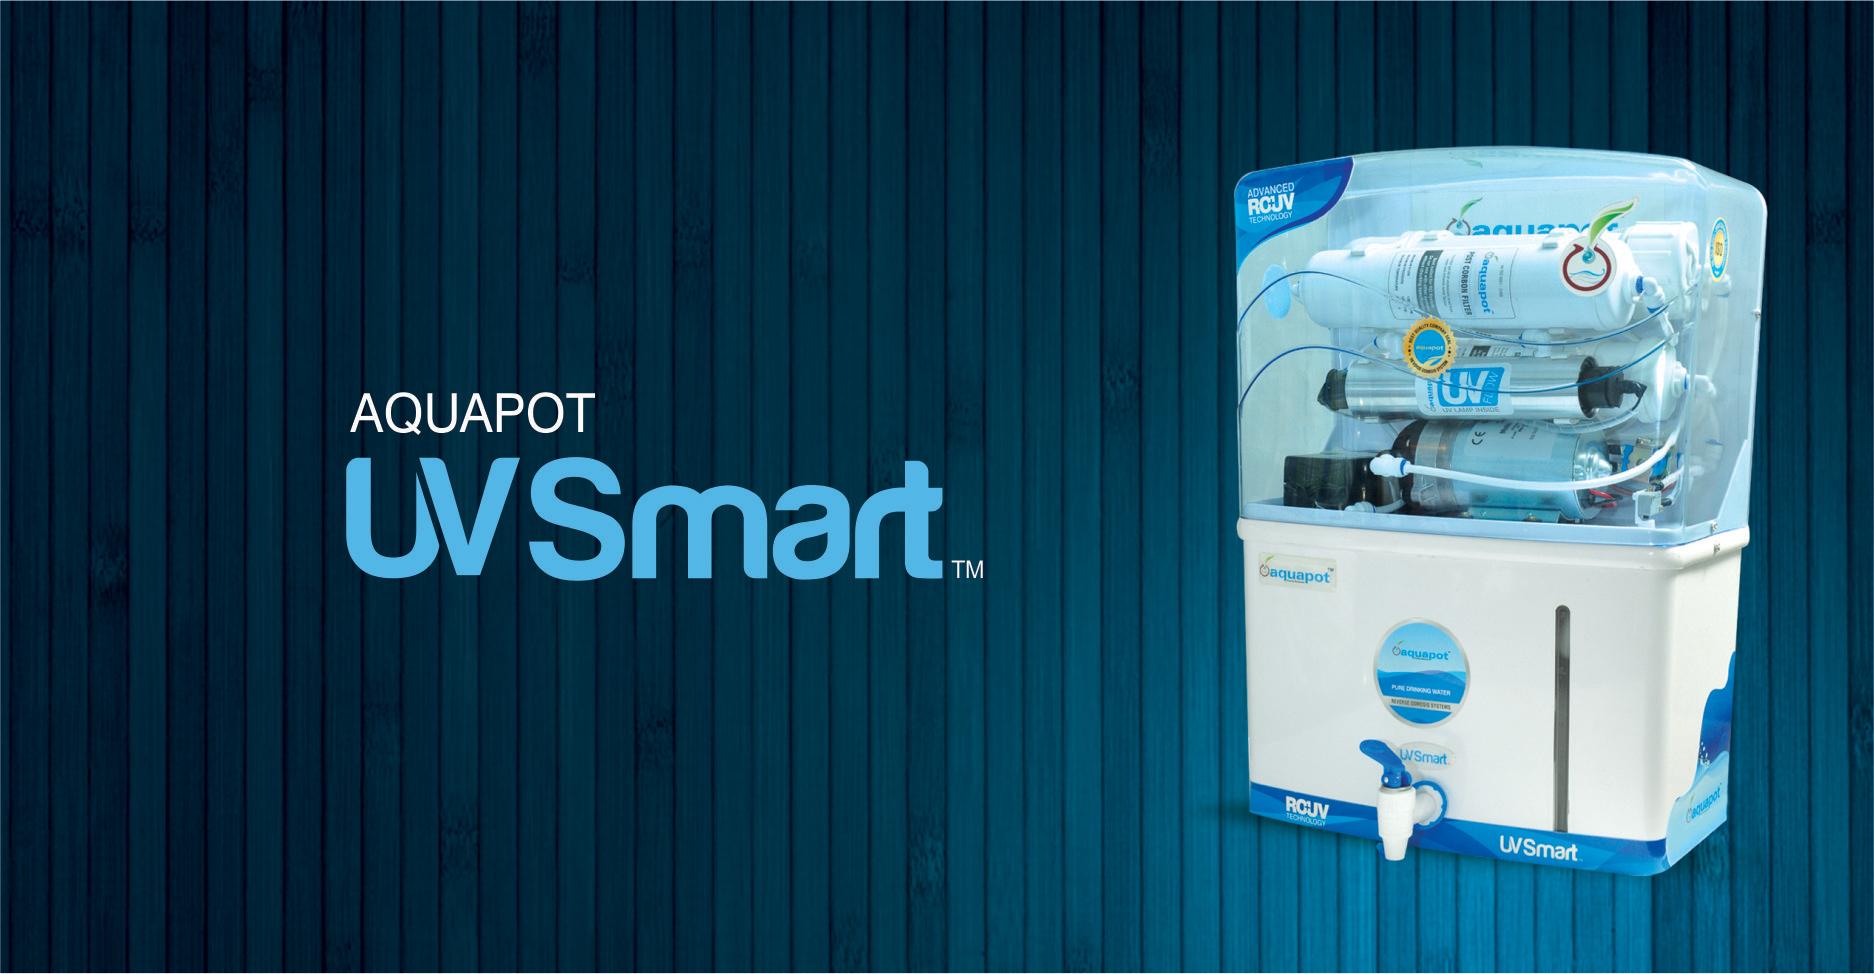 Aquapot UV Smart RO + UV Water Purifier Image